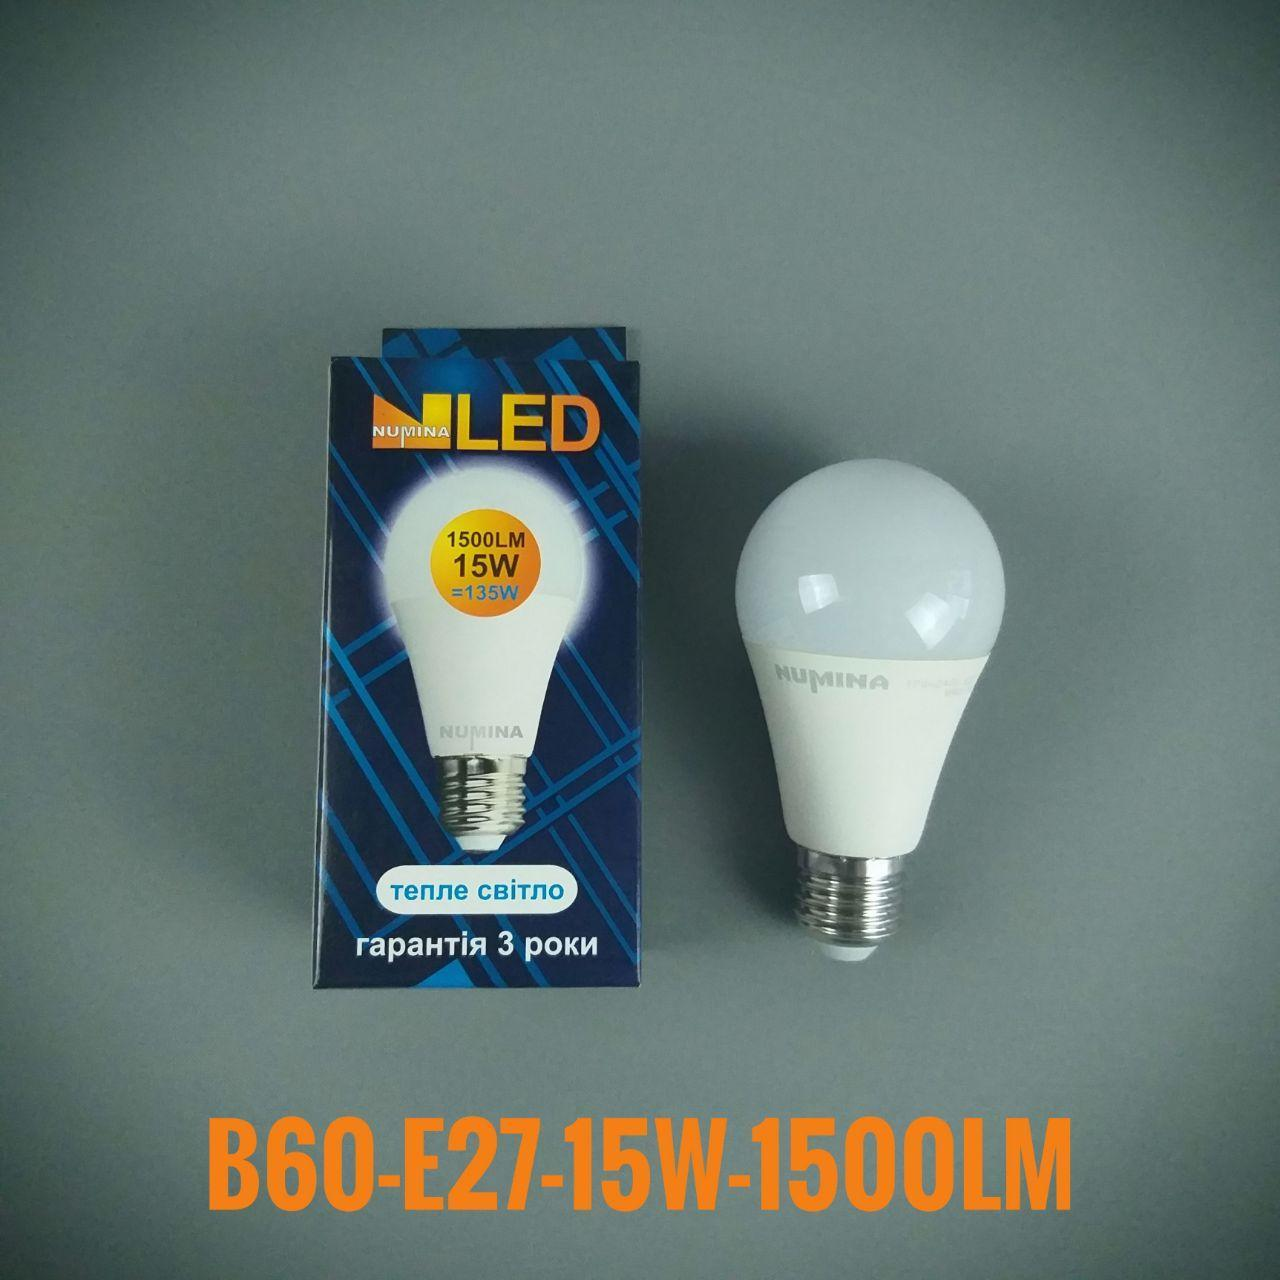 Светодиодная лампочка LAMP PREMIUM B60AP 15W E27 3000K 270